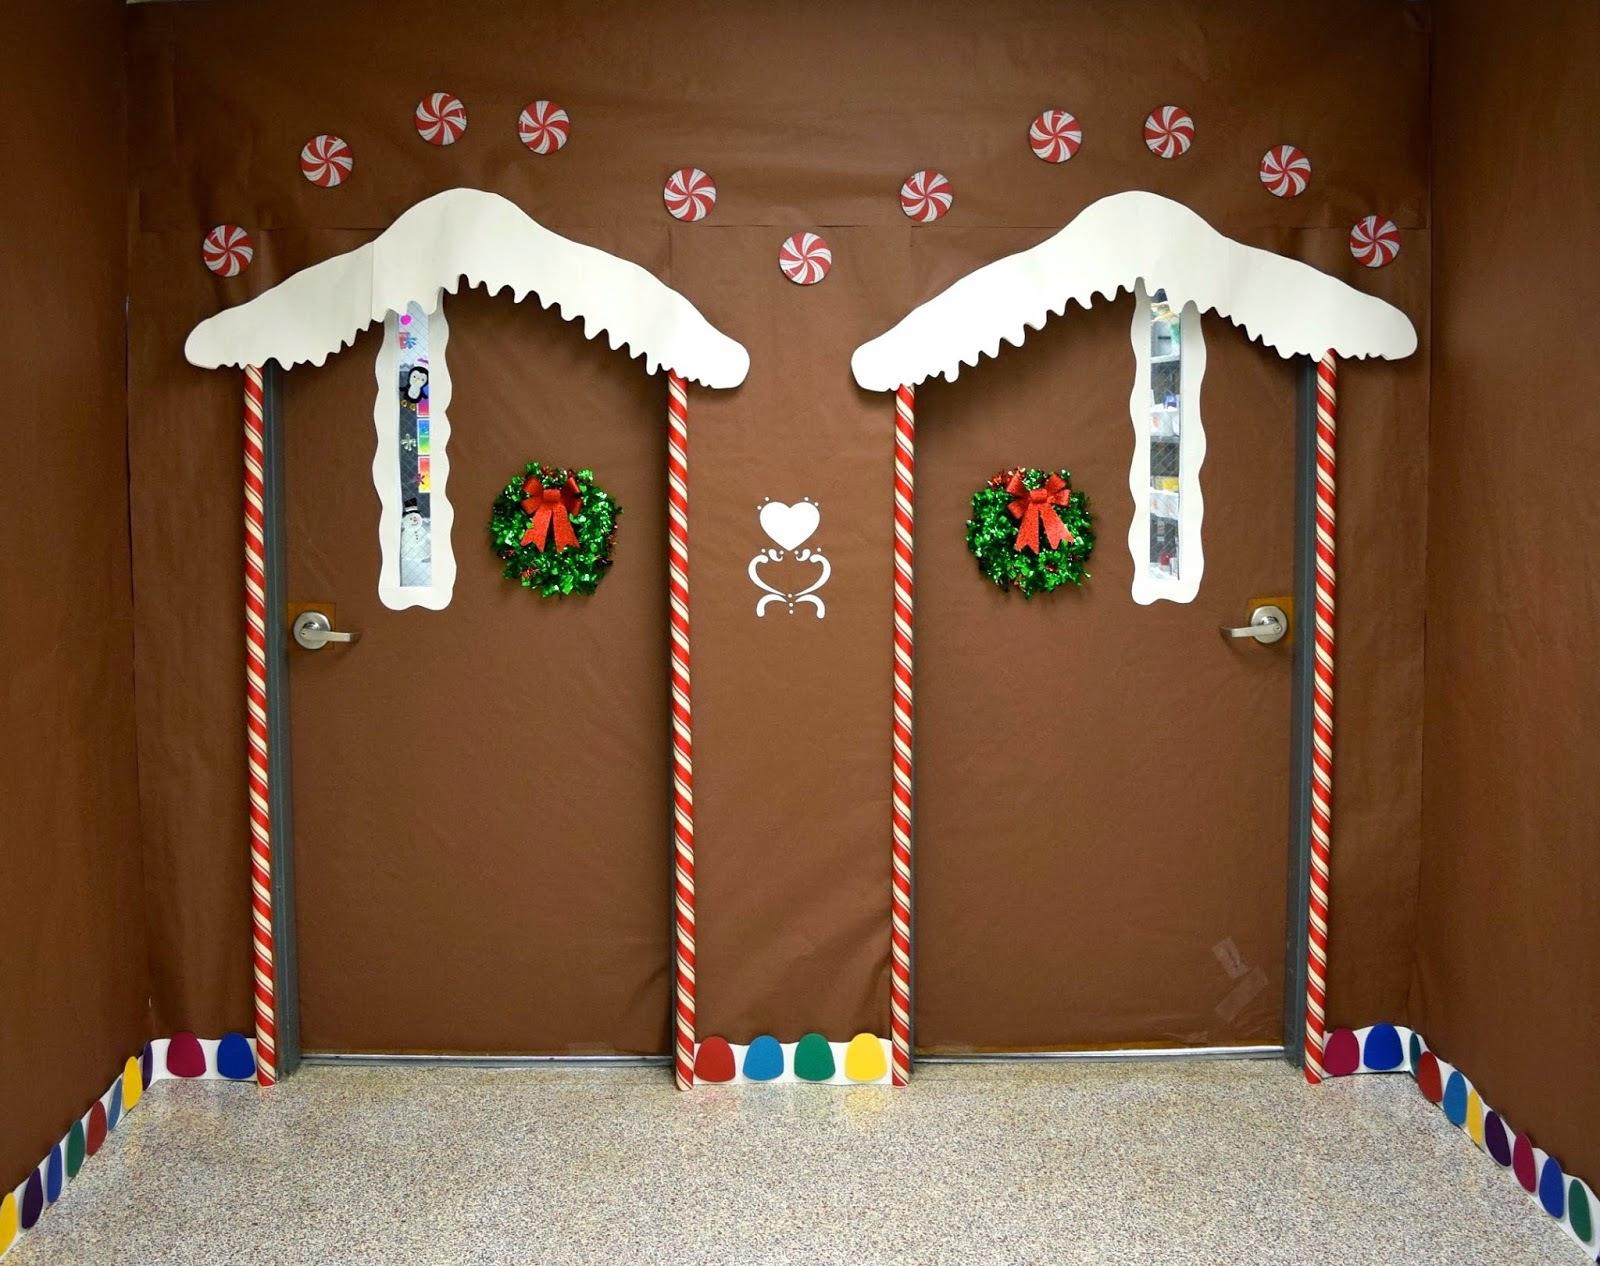 Fullsize Of Christmas Door Decorating Ideas